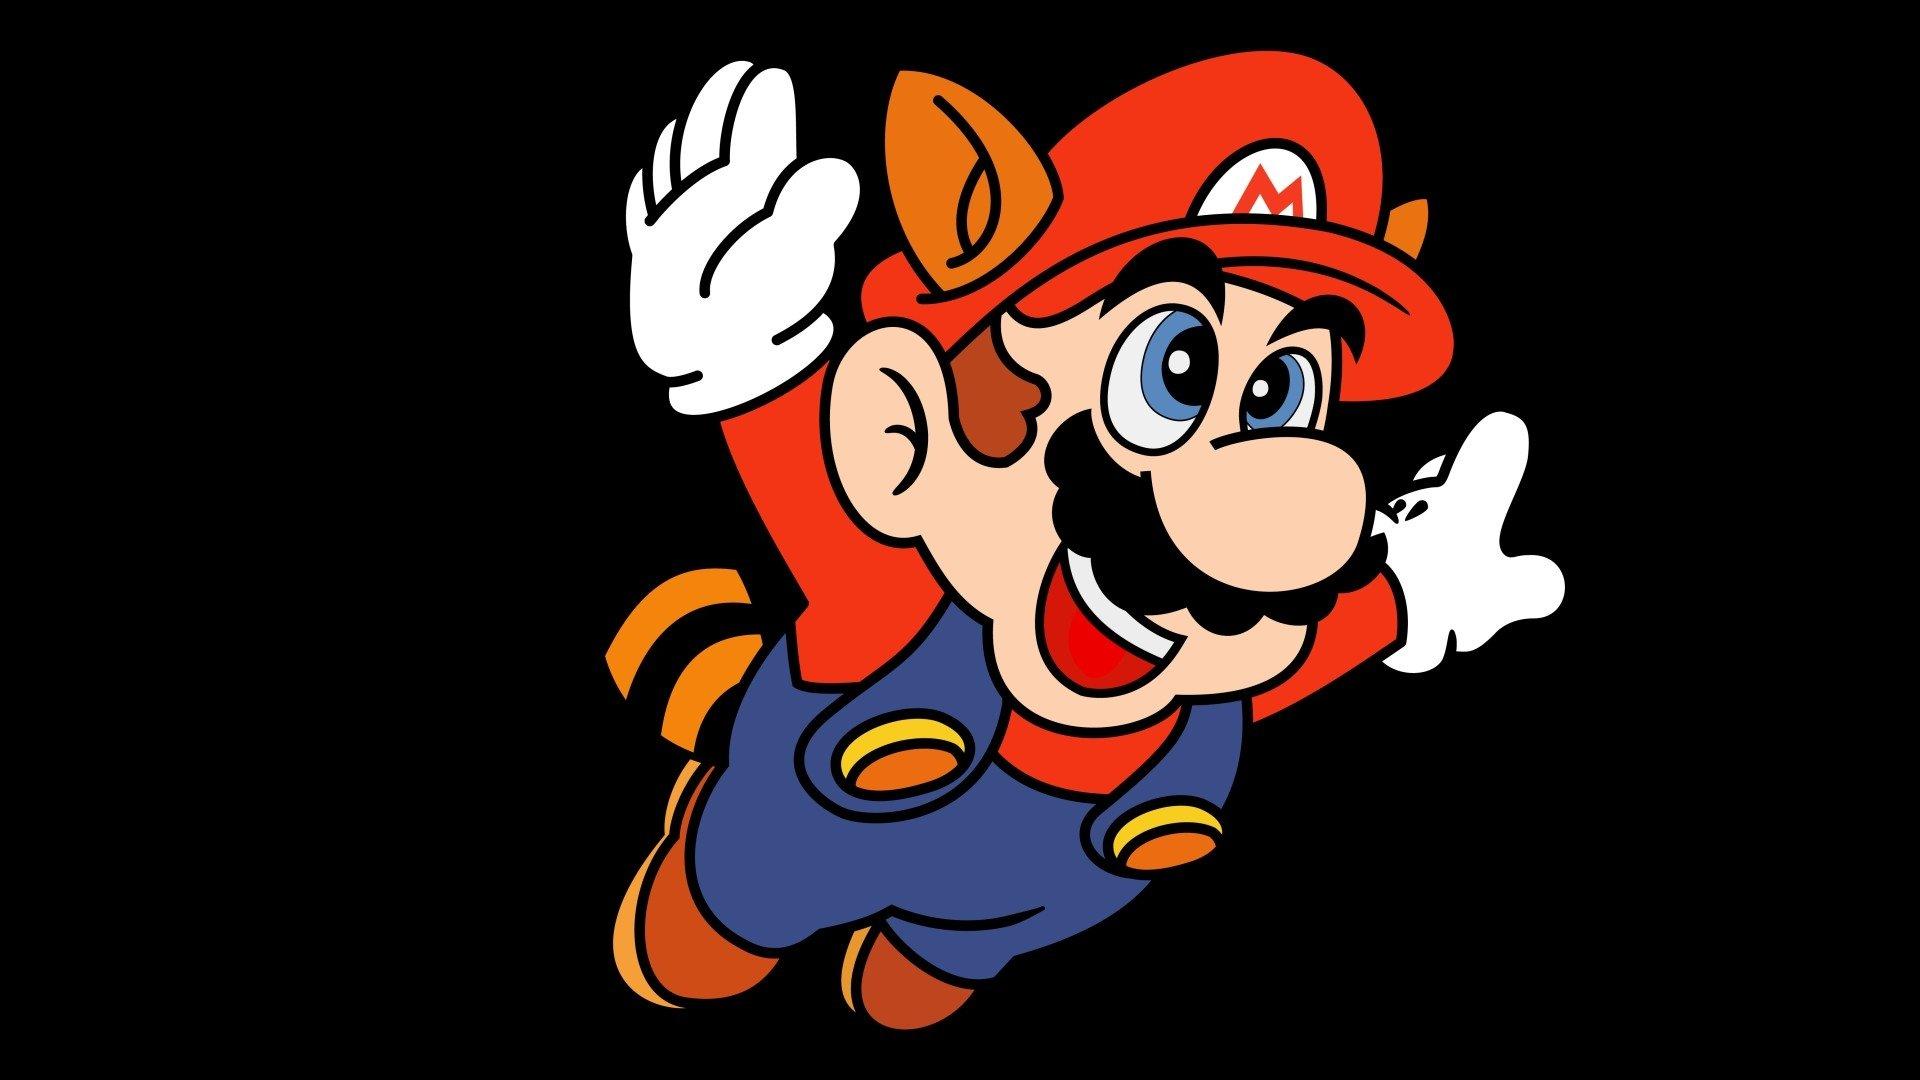 2 Super Mario Advance 4 Super Mario Bros 3 Hd Wallpapers